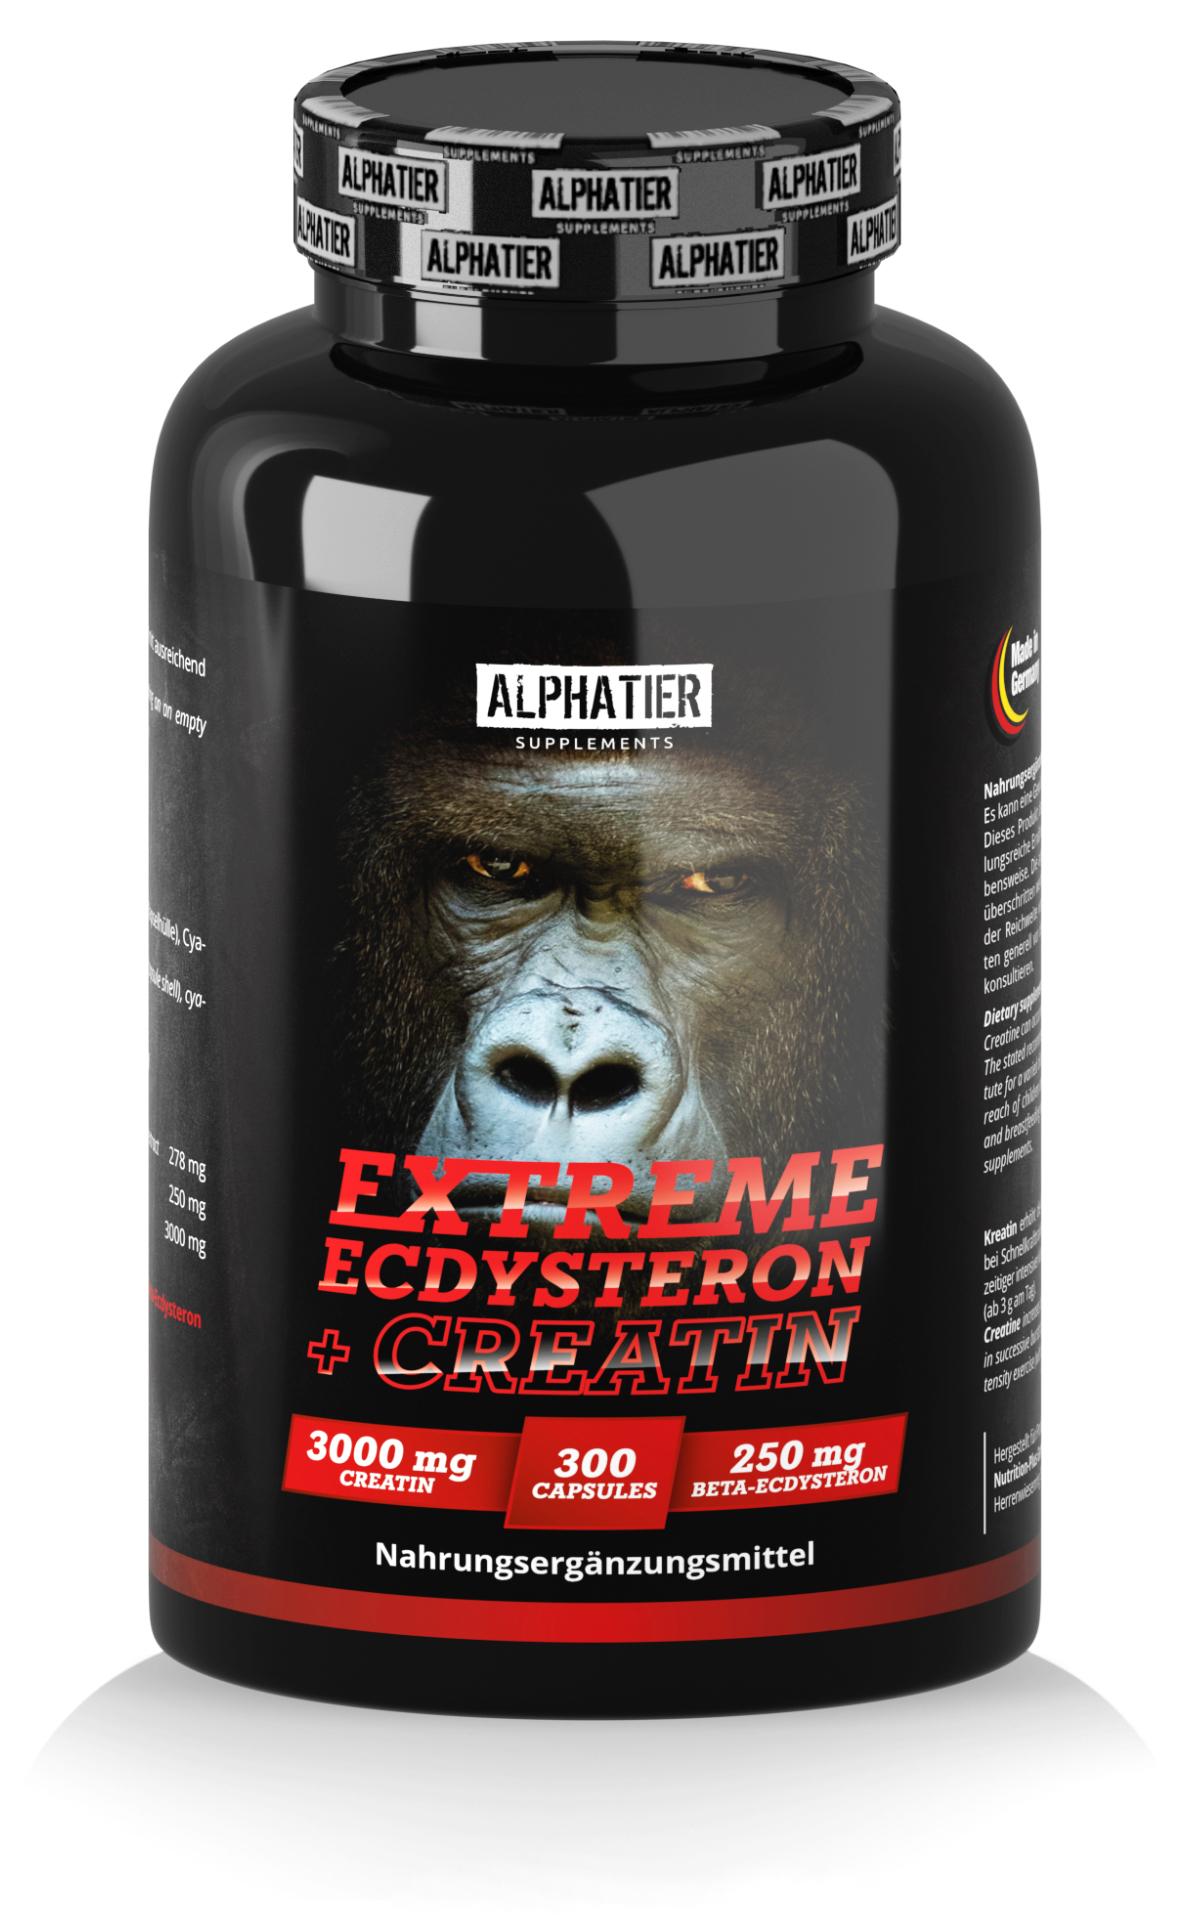 Alphatier Extreme Ecdysteron + Creatin - Alphatier Supplements